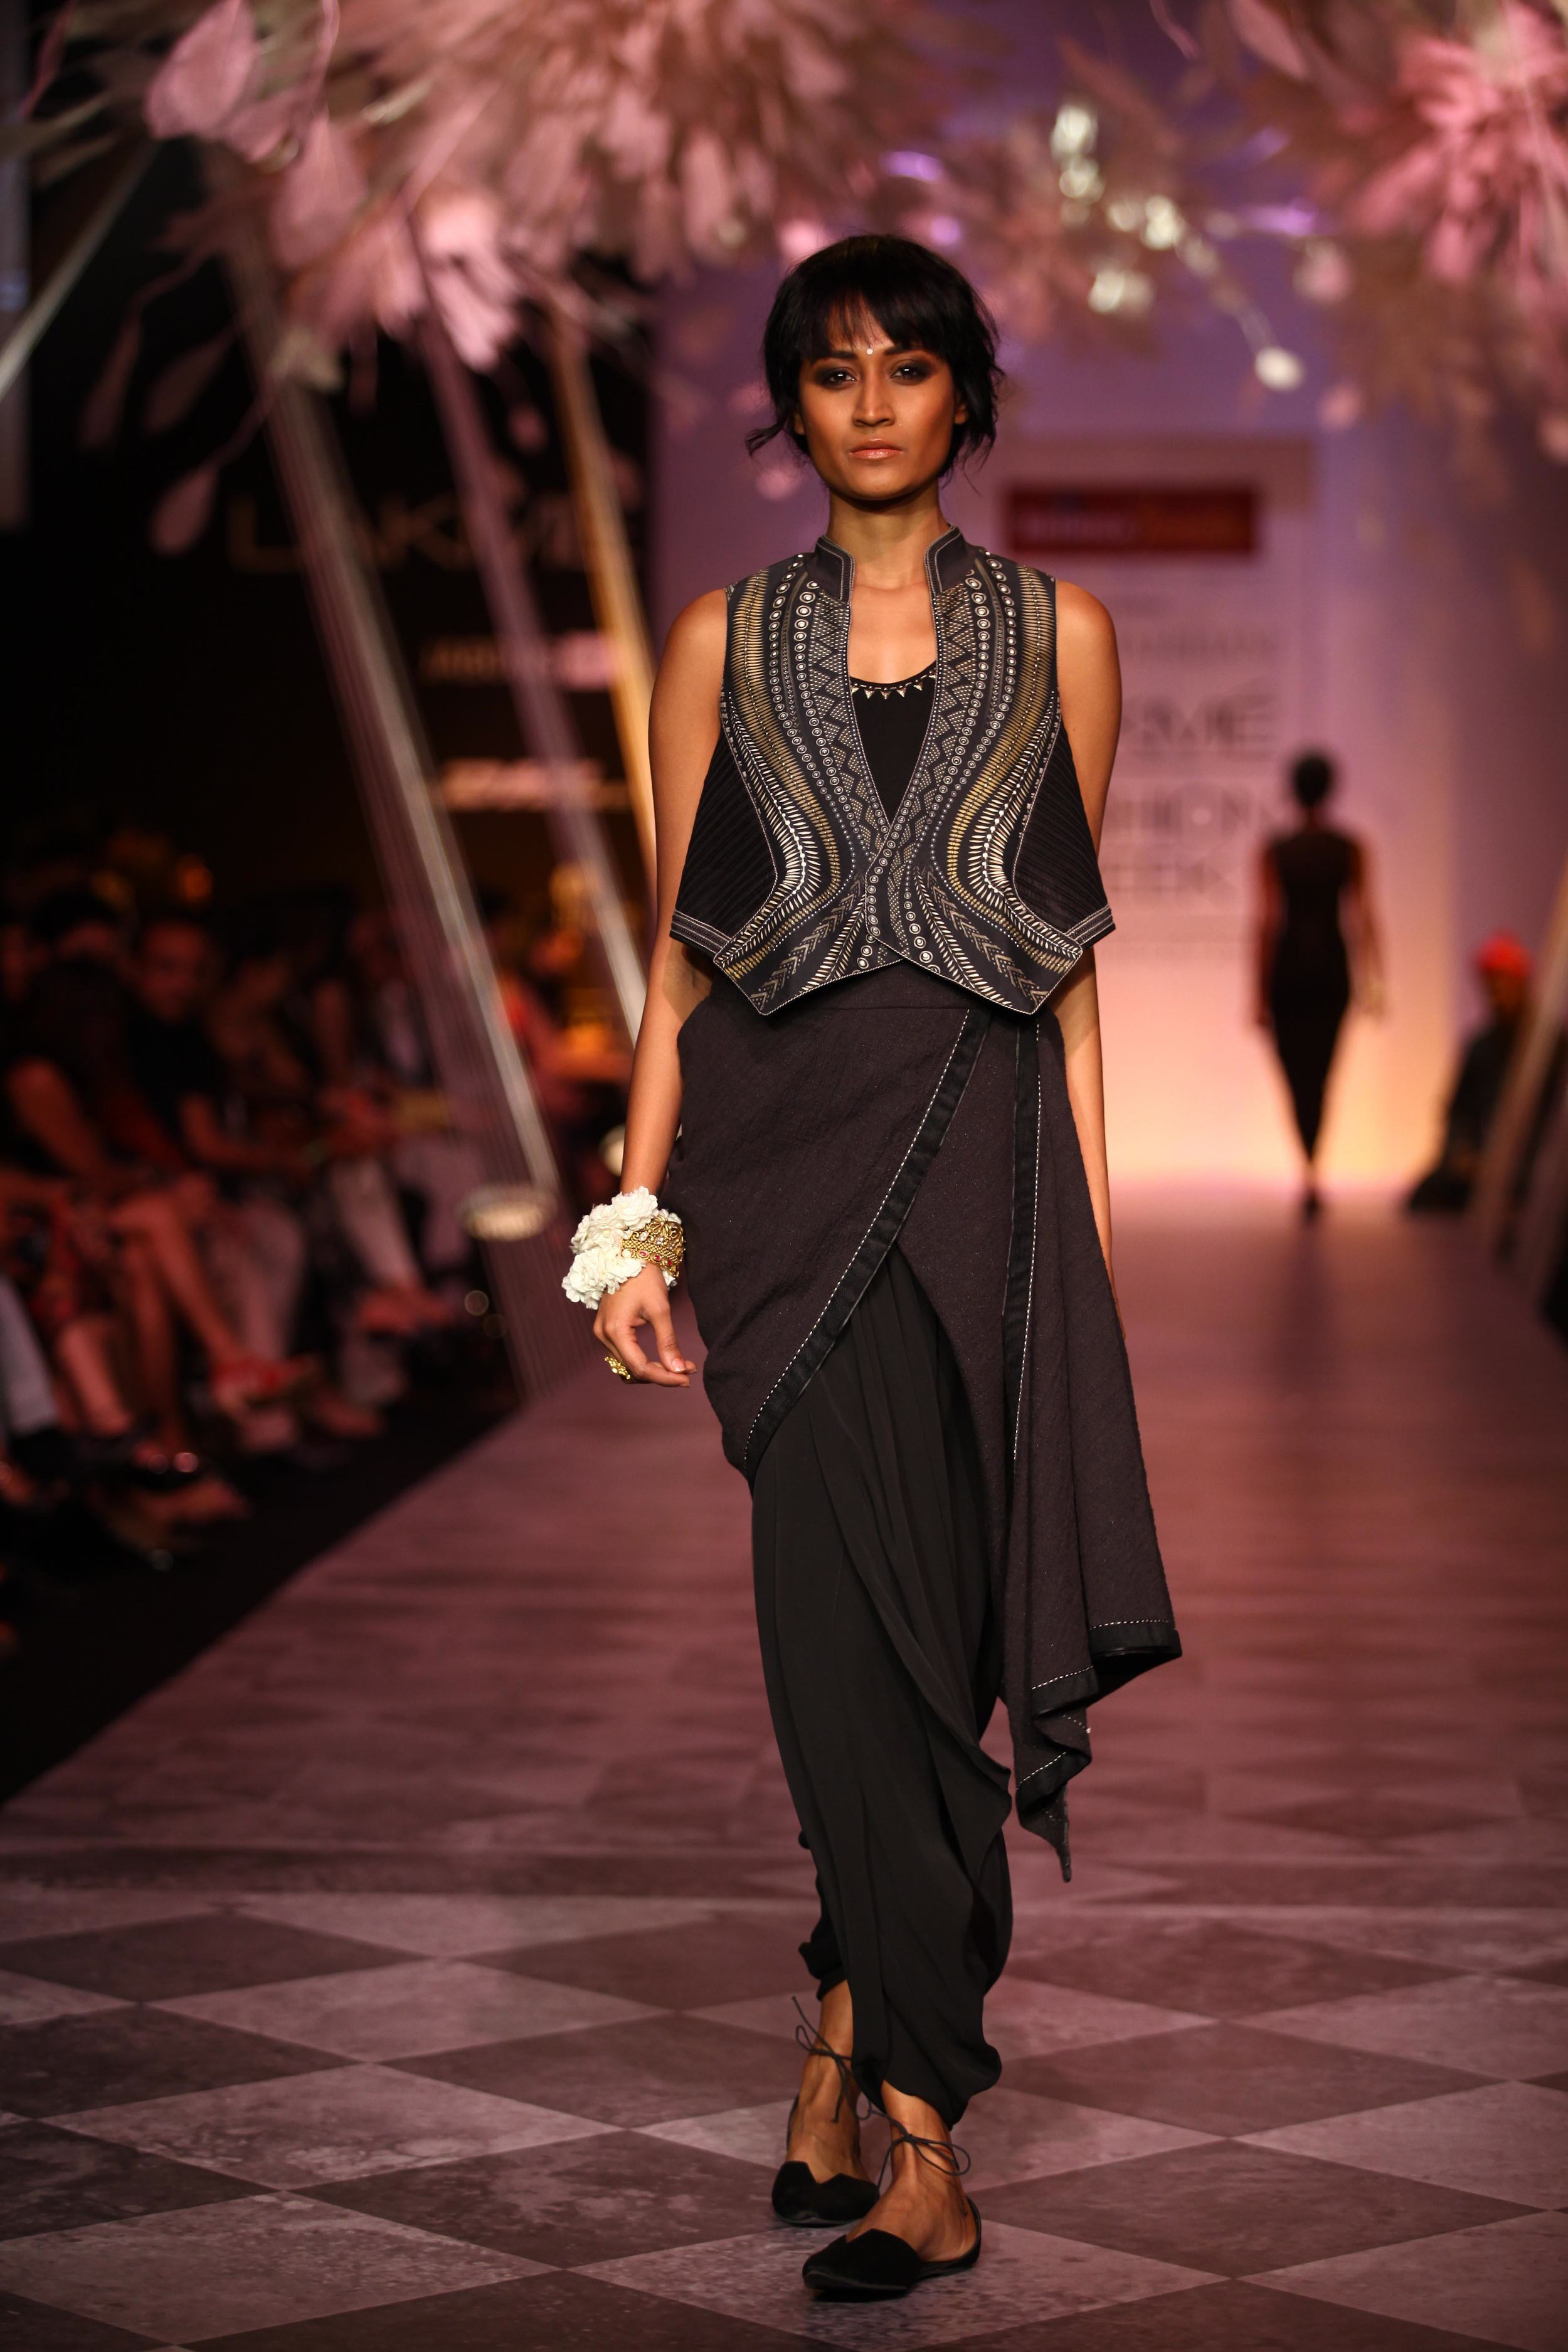 Tarun Tahiliani SS'14 Collection at LFW SR 2014 2.jpg